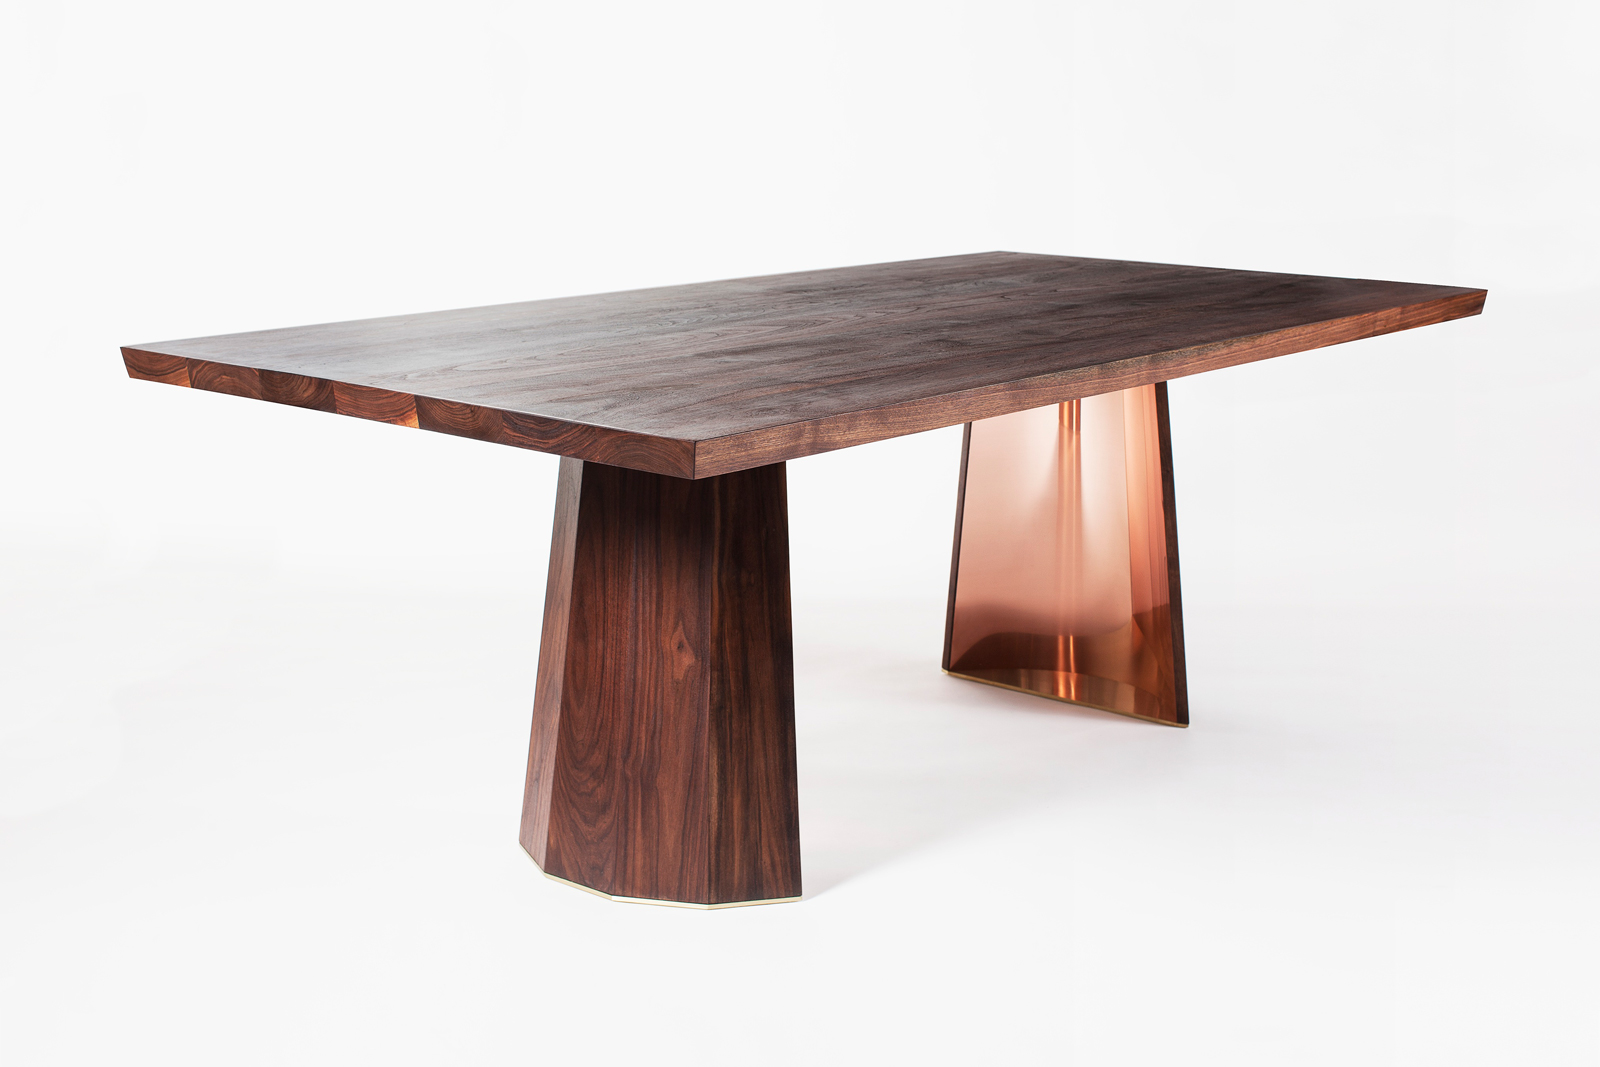 Cleat Series by design studio Commune